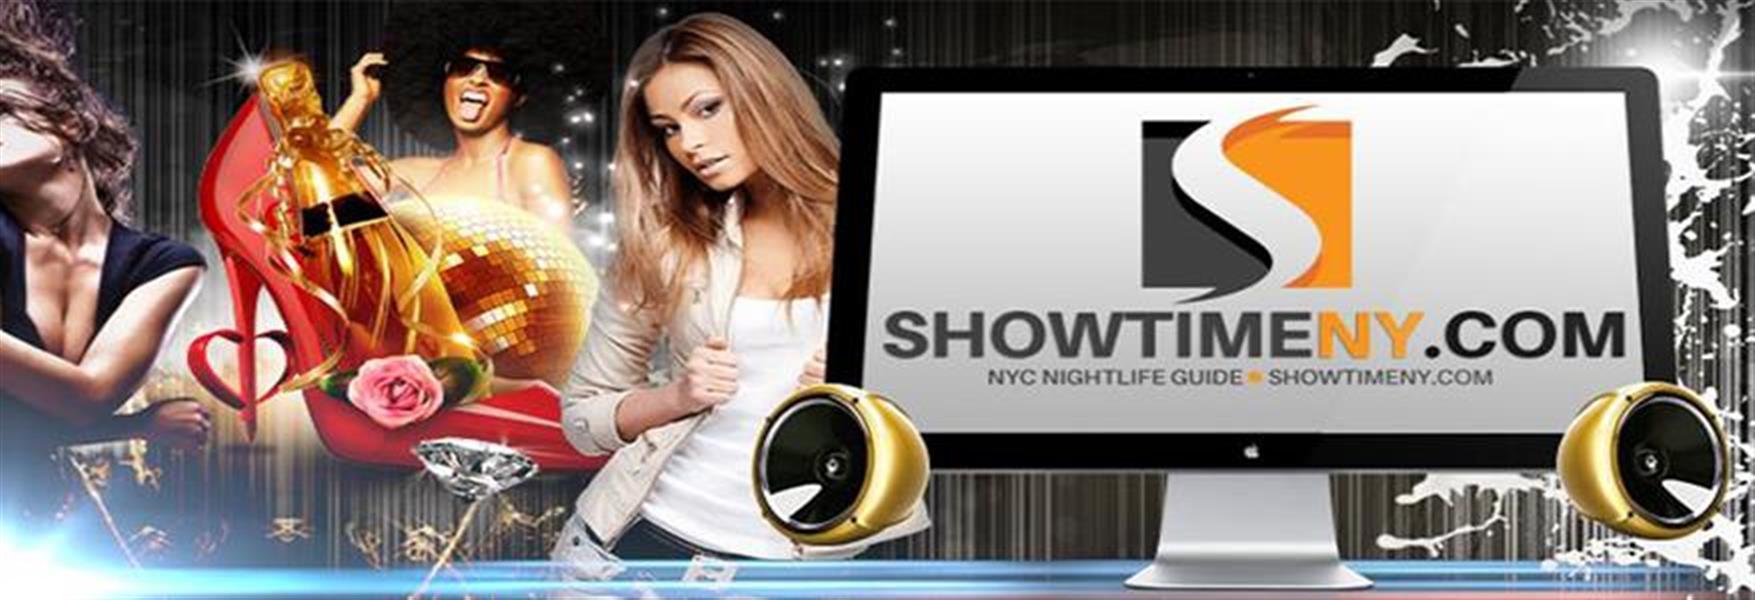 0c1d18cb-8764-46af-8e02-7fc9f96999b1_showtime banner long.jpg